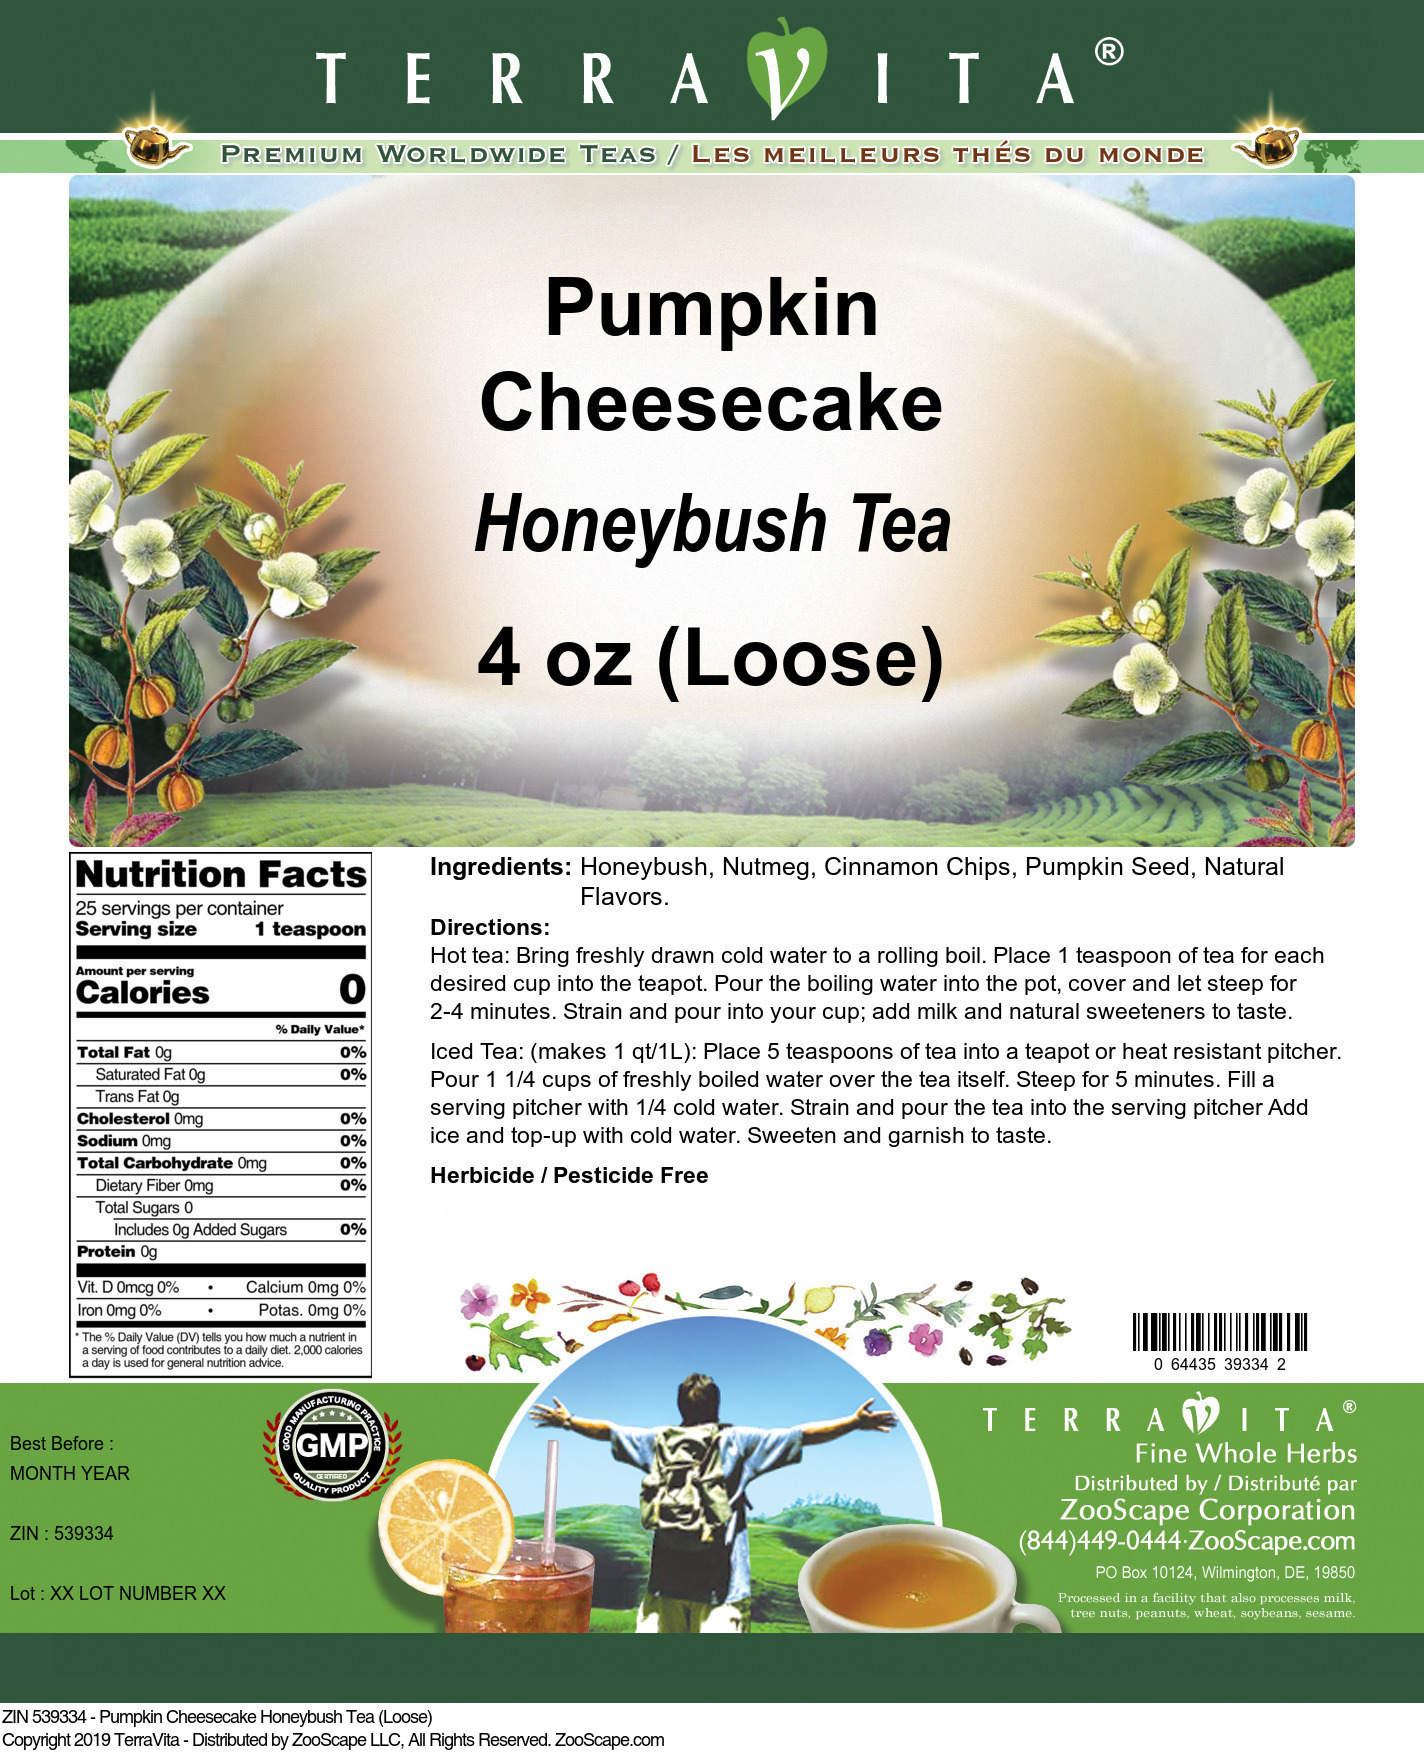 Pumpkin Cheesecake Honeybush Tea (Loose)